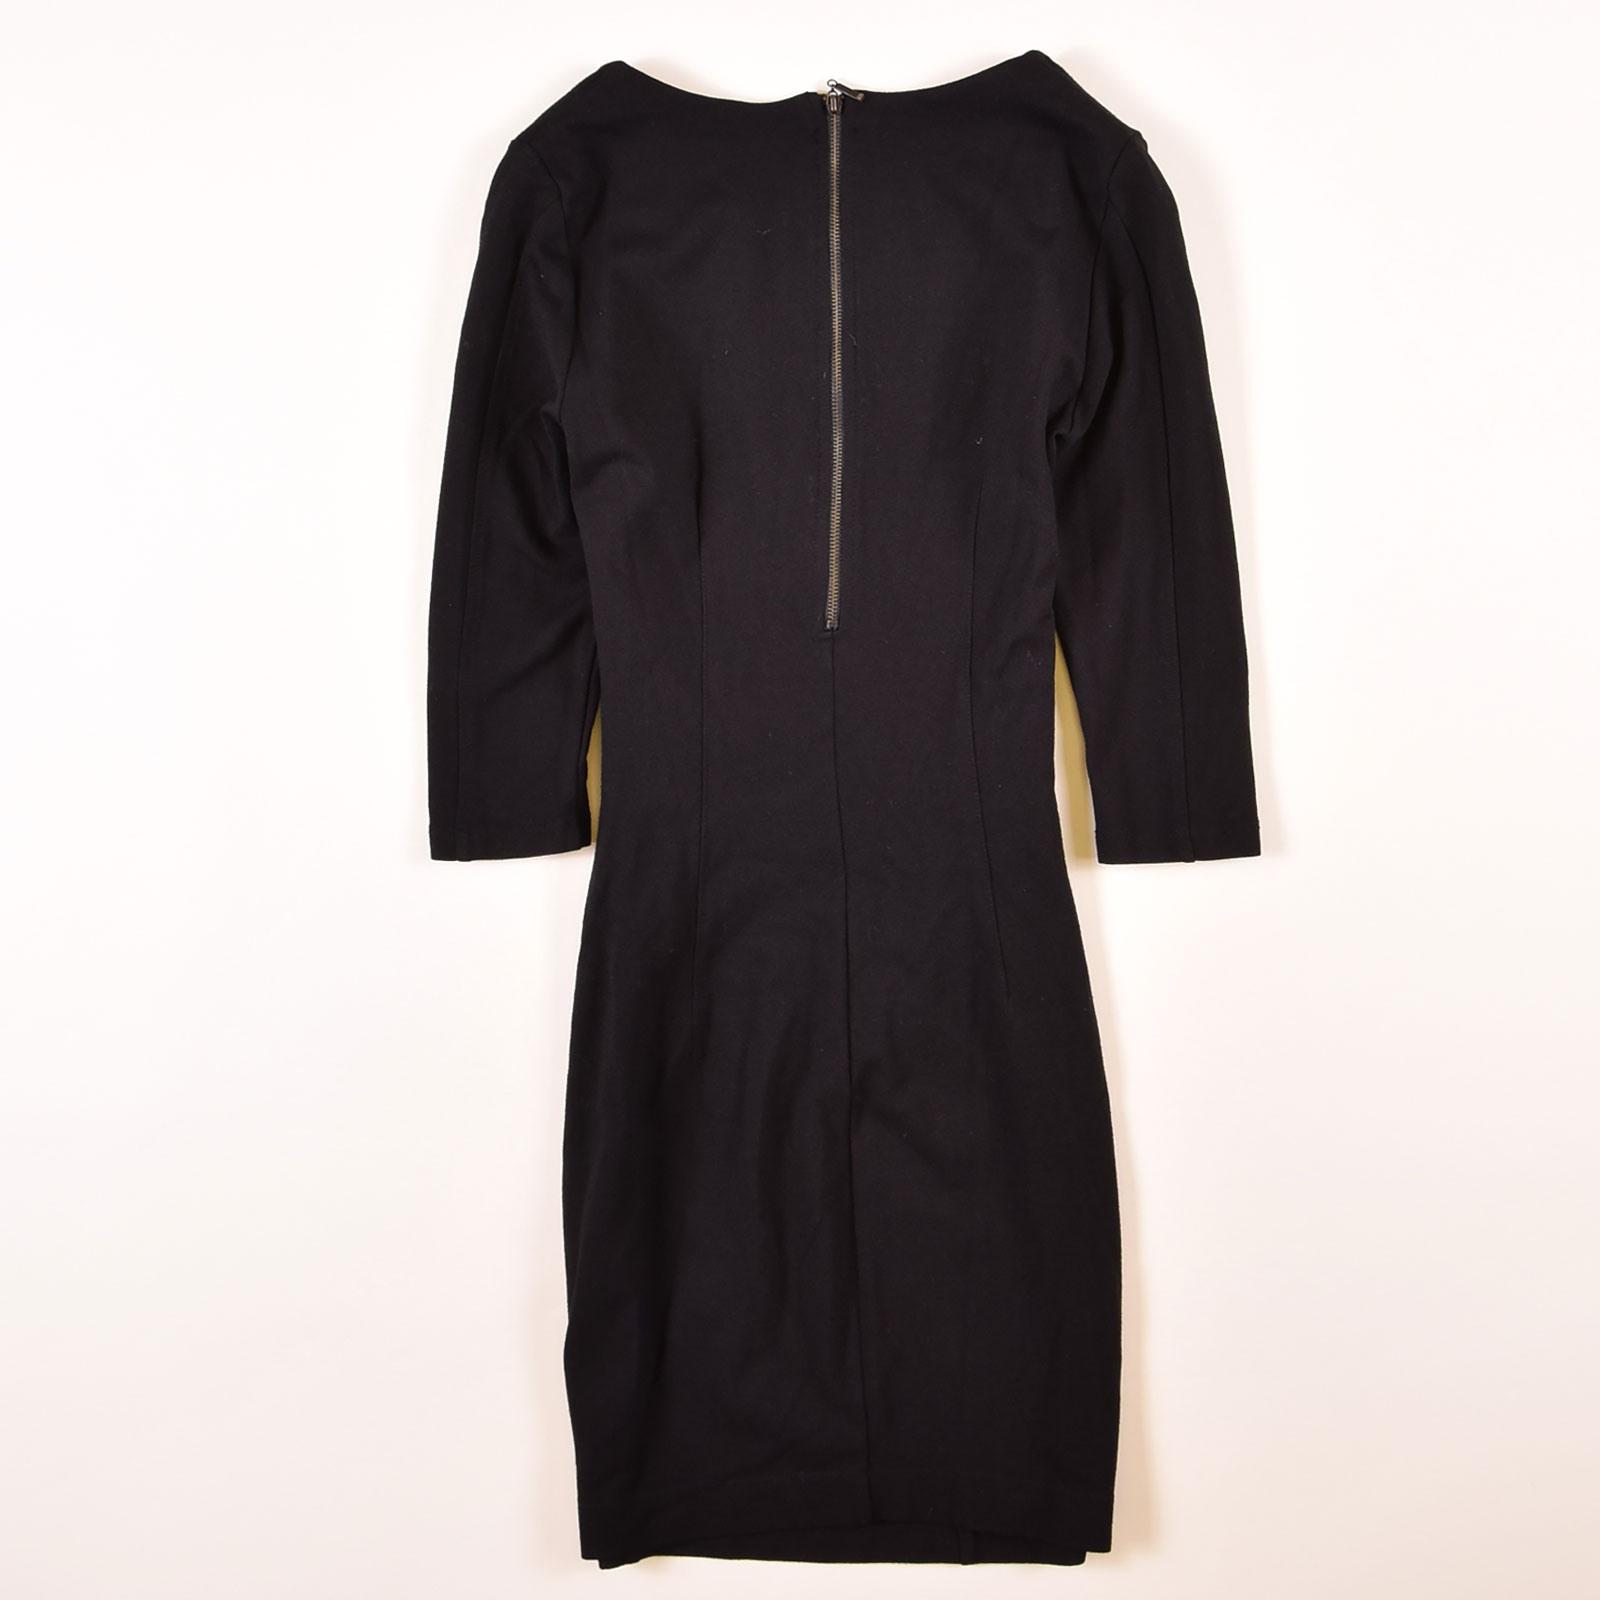 Zara Damen Kleid Dress Bodycon Elegant Vausschnitt Grm